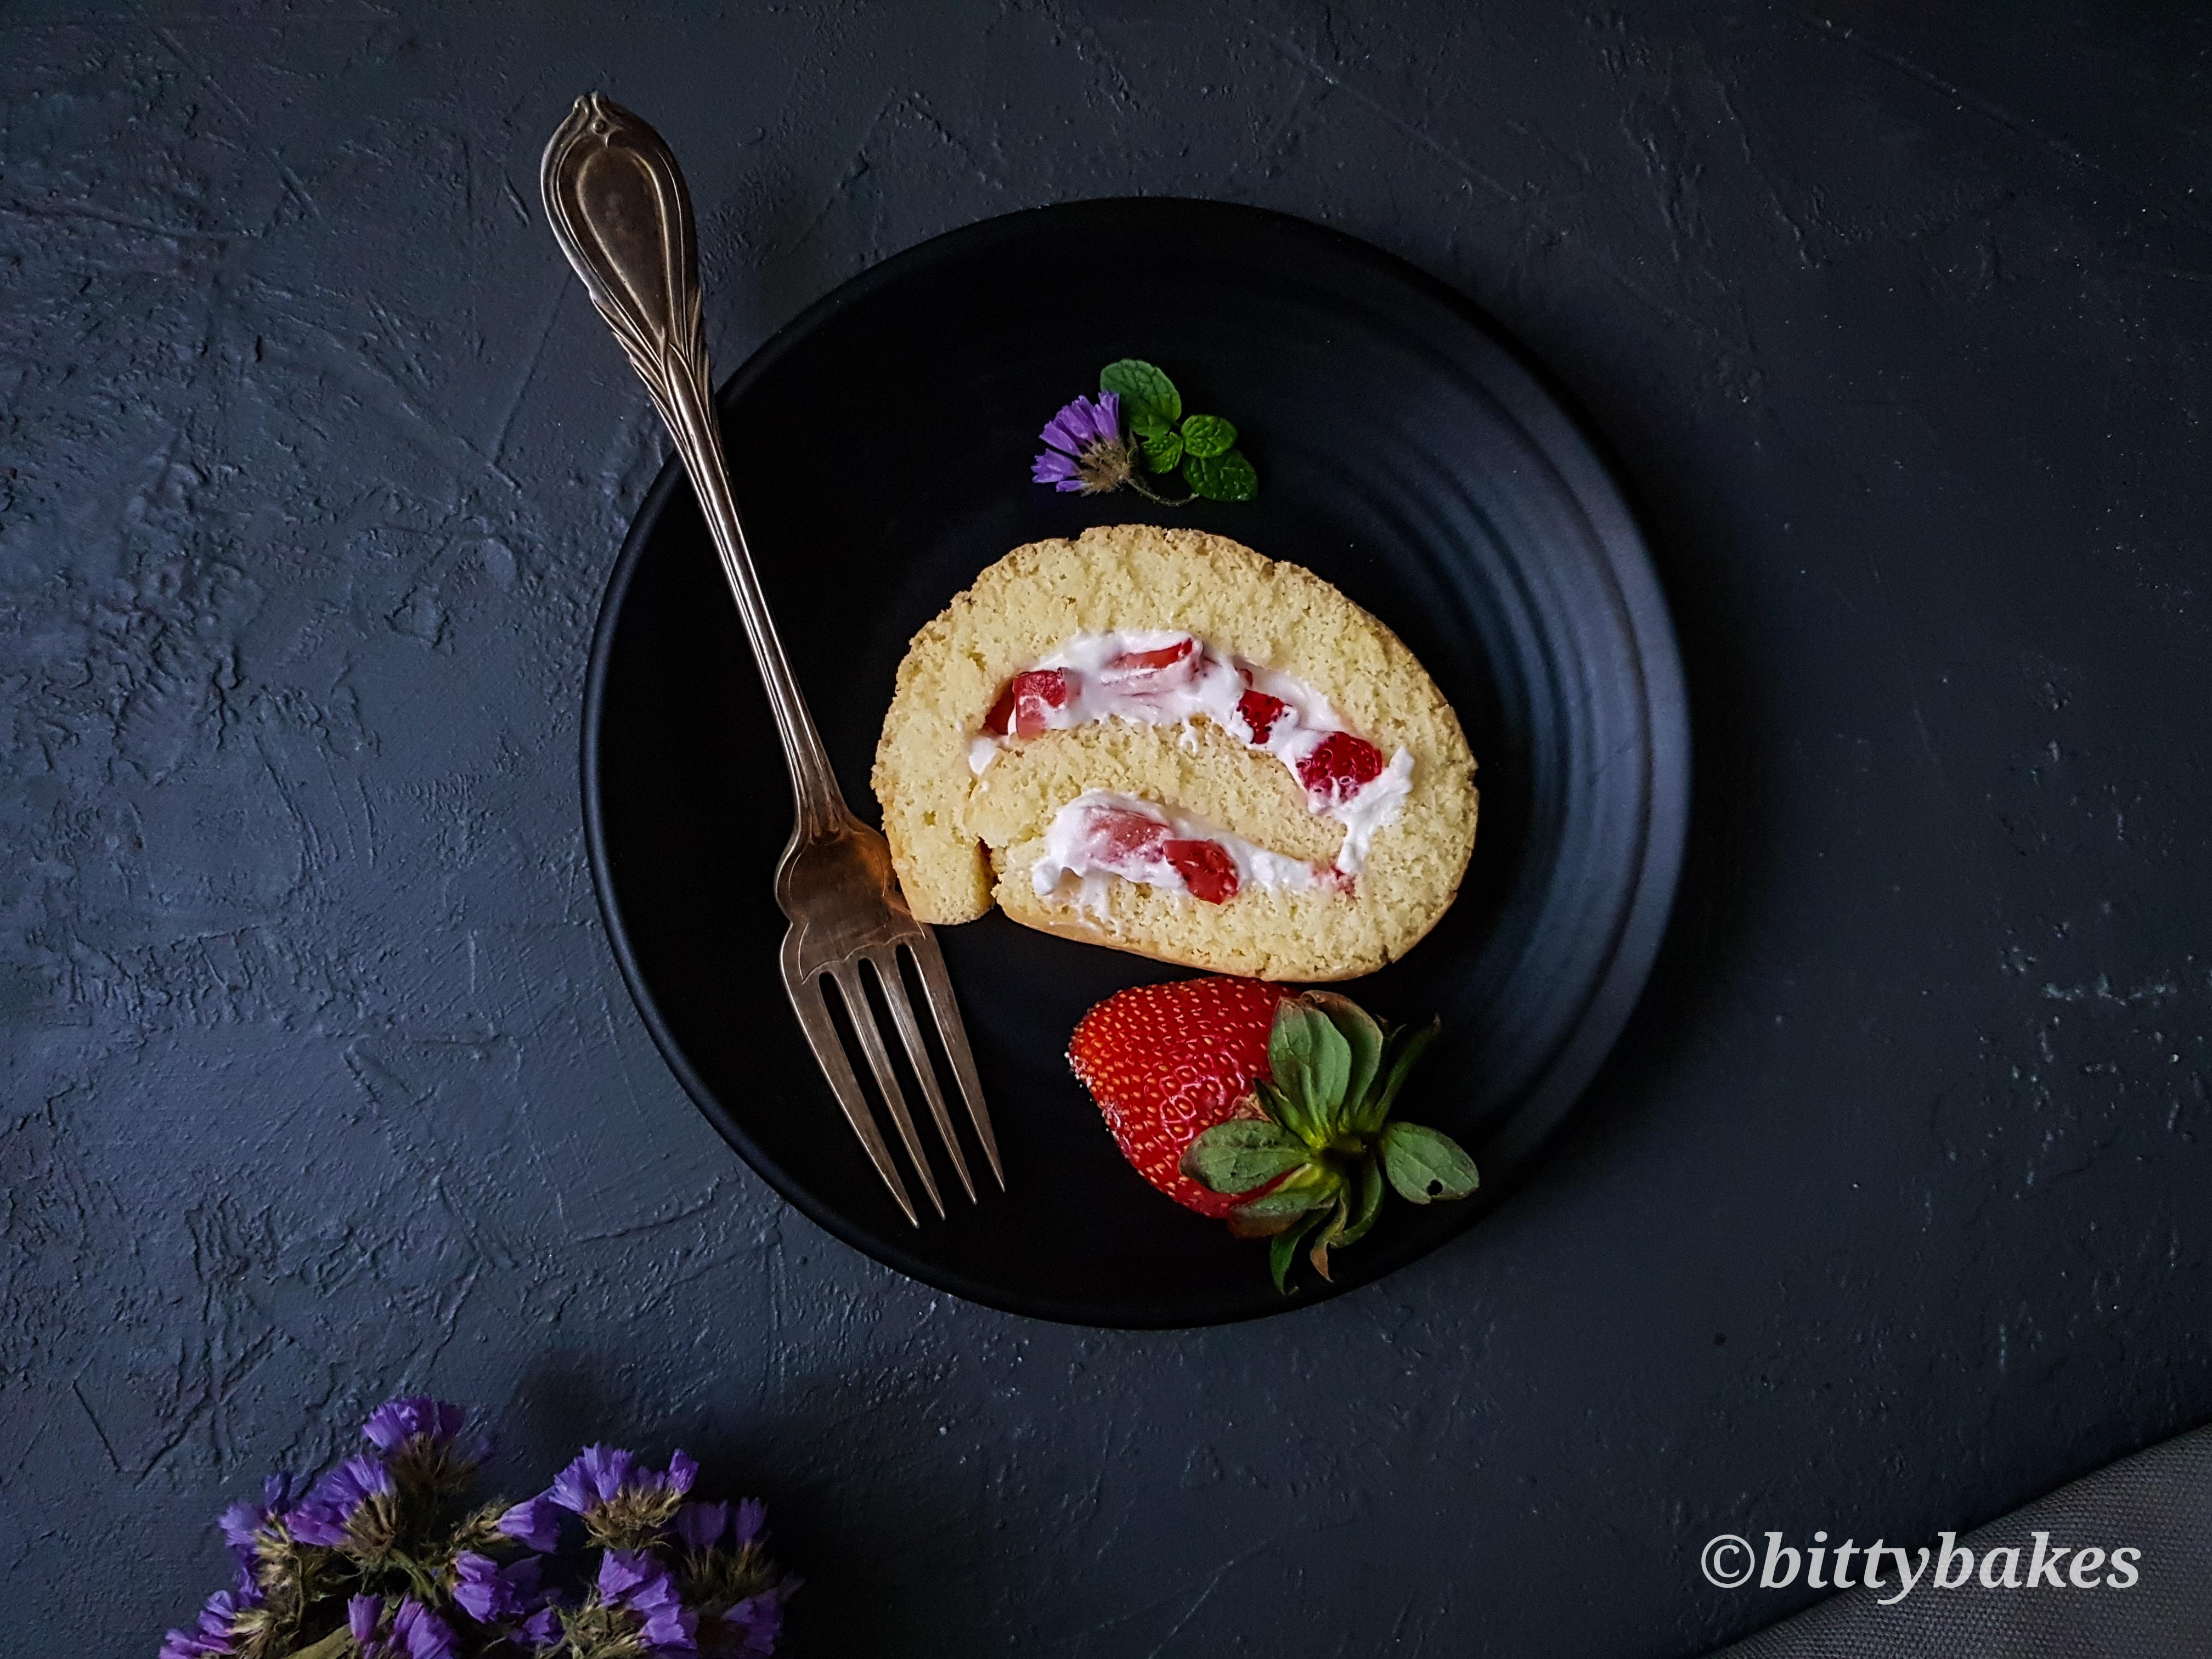 Strawberry and Cream Swiss Roll